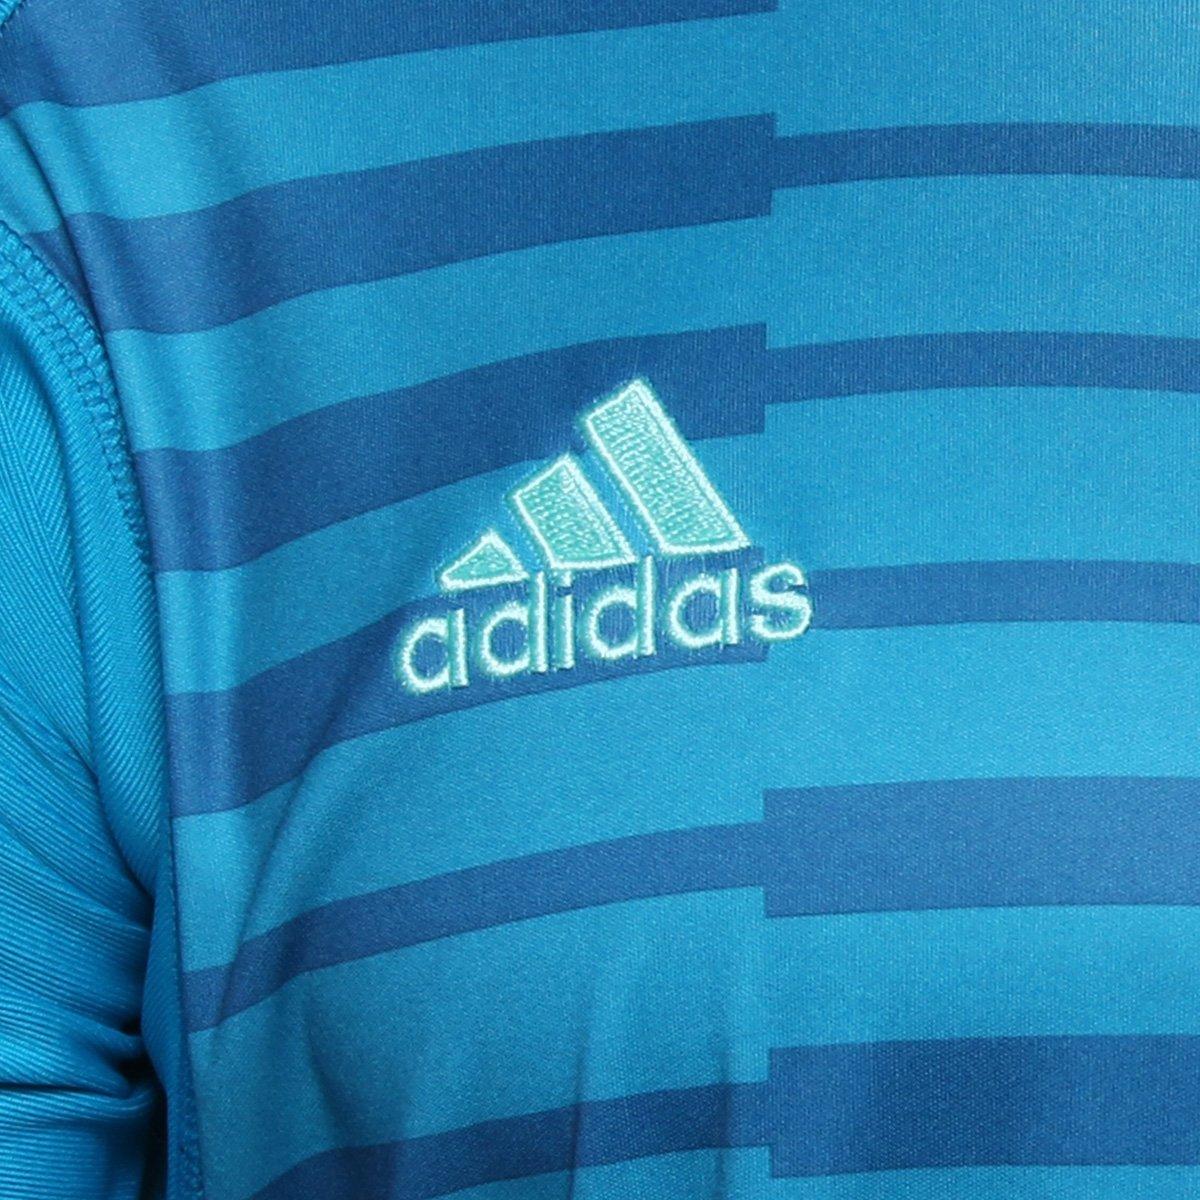 25fabf5ef1 Camisa Adidas Goleiro Adipro 18 Masculina - Azul - Compre Agora ...